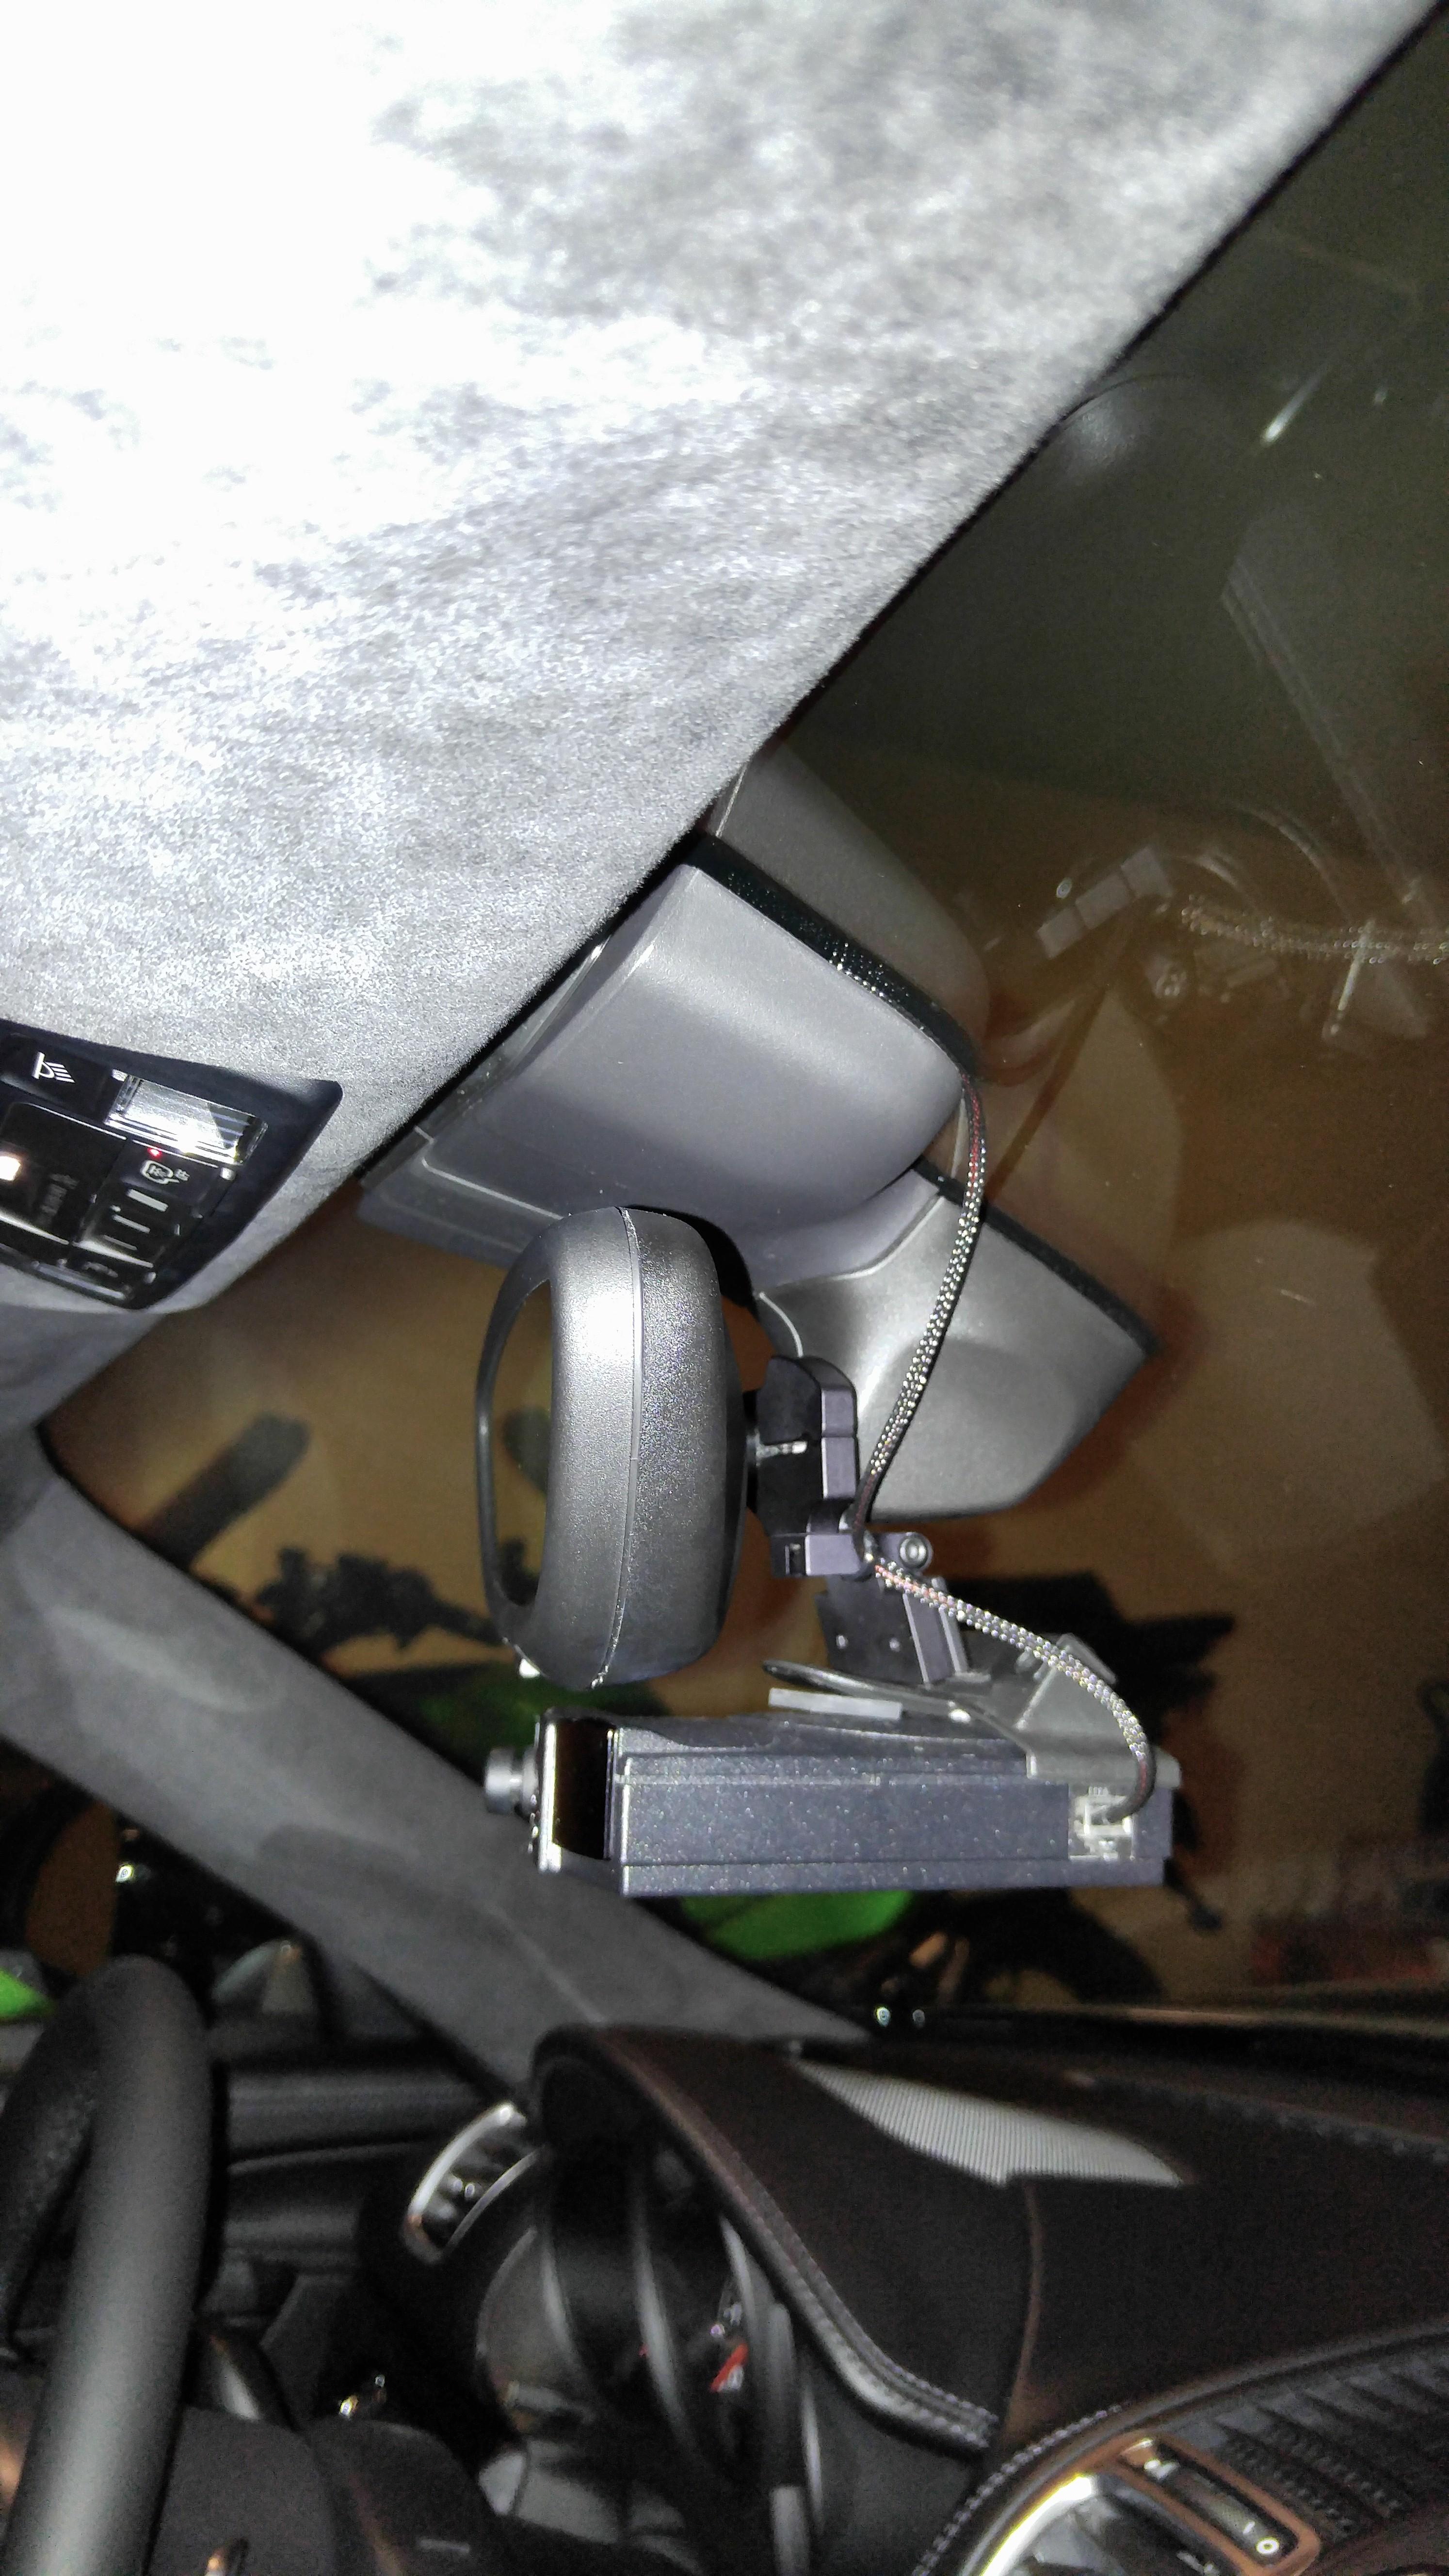 Removing 12v Panel In Passenger Footwell Fiat 500 Fuse Box Cigarette Lighter Cayman Rd 1